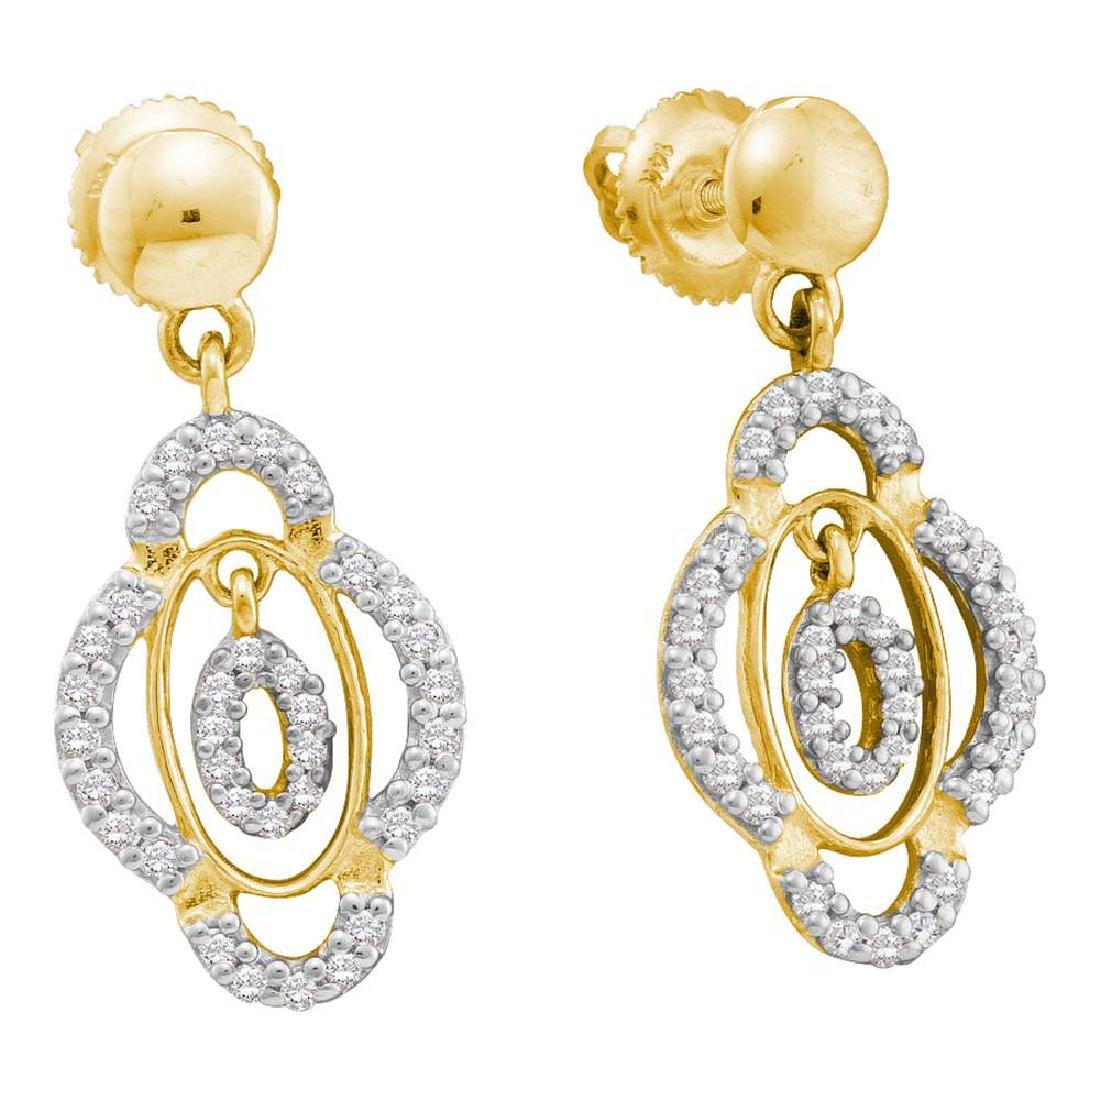 0.40 CTW Diamond Dangle Screwback Earrings 14KT Yellow